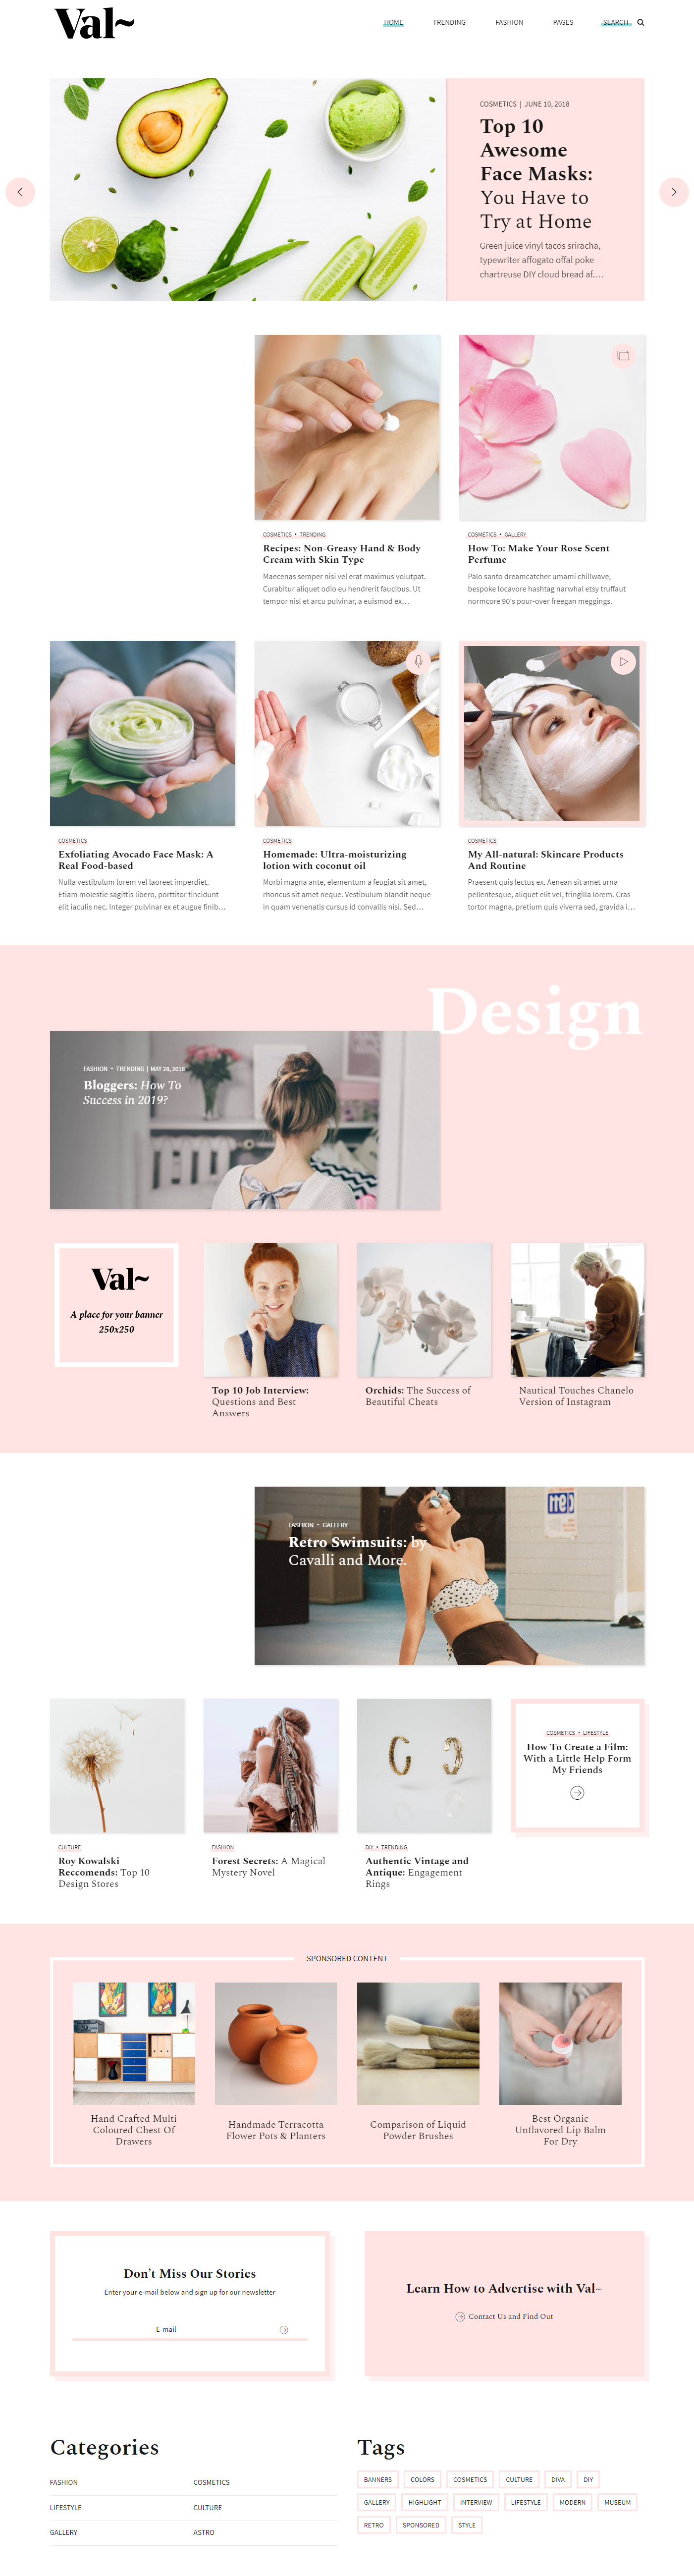 https://val.bold-themes.com/wp-content/uploads/2018/10/Pink-Demo-Boxed-Slider.jpg